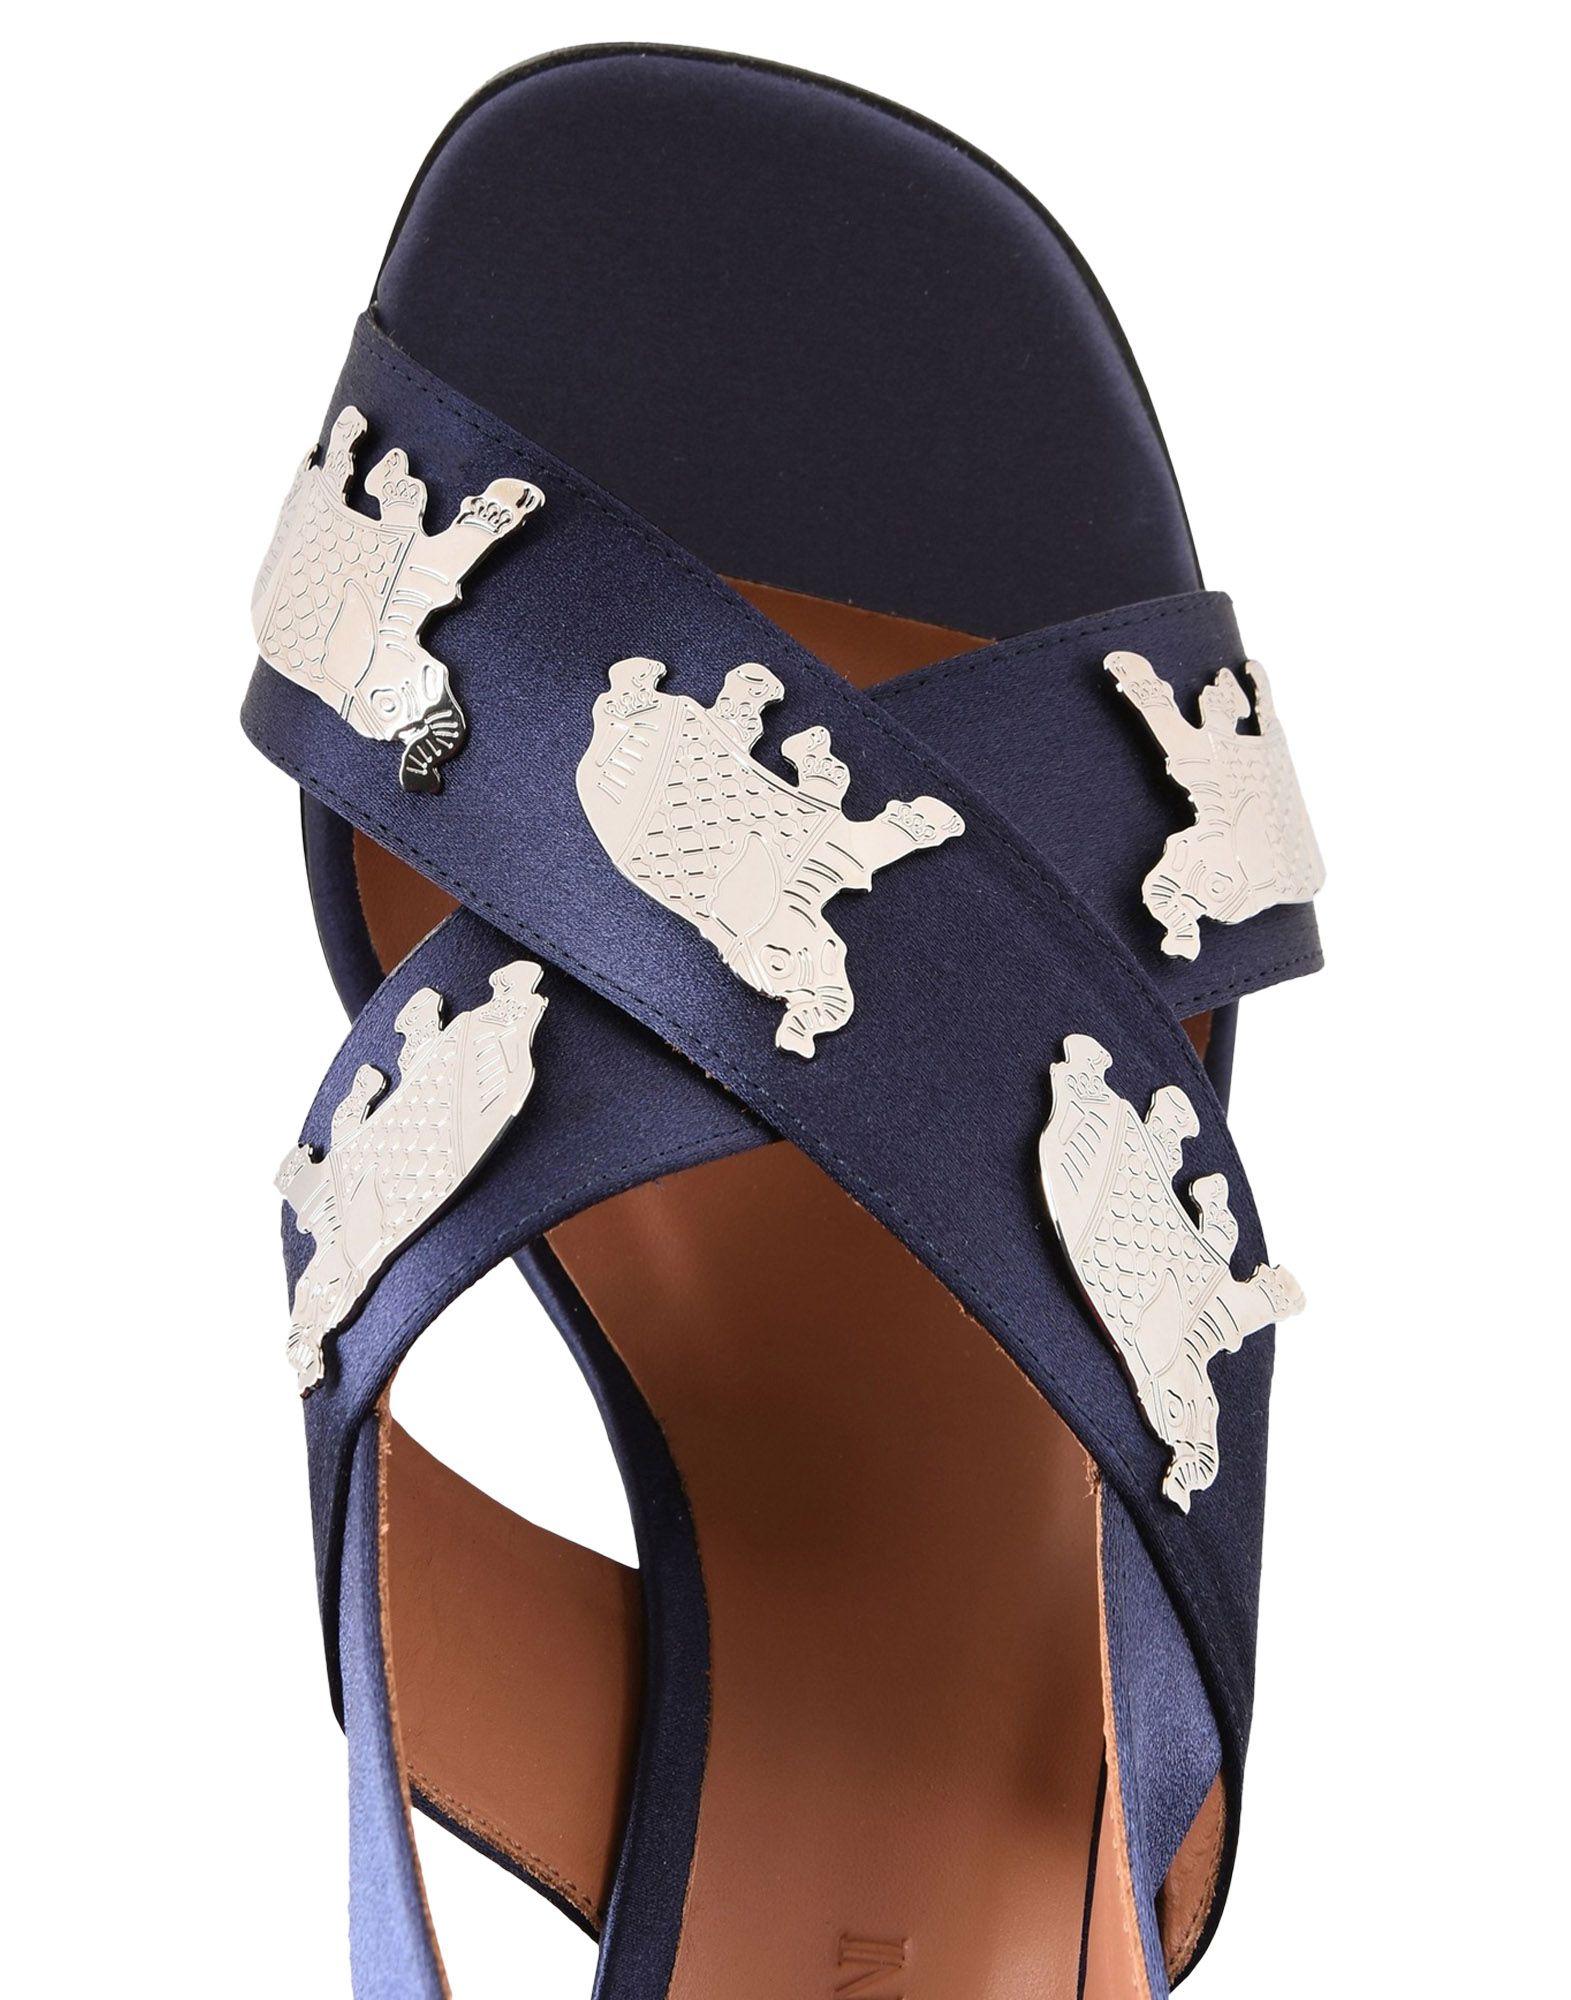 Sandales Emporio Armani Femme - Sandales Emporio Armani sur